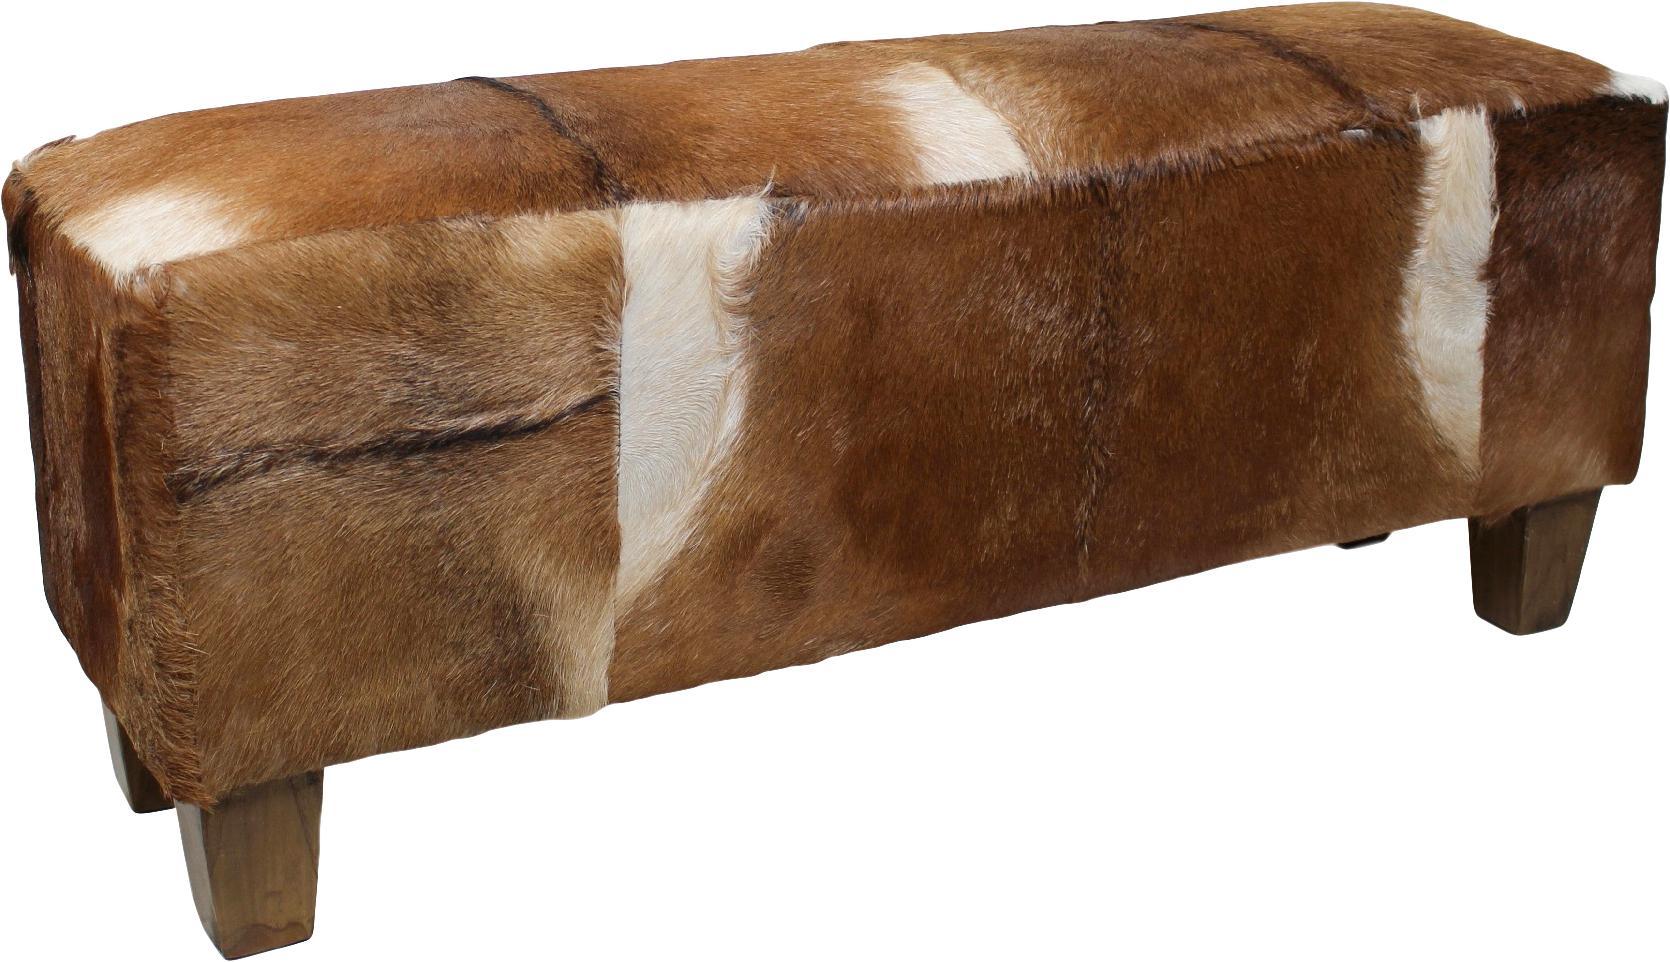 Sitzbank Bangku mit Ziegenfell, Bezug: Ziegenfell, Bezug: Ziegenfell, Braun und Weiss<br>Füsse: Teakholz, 110 x 40 cm